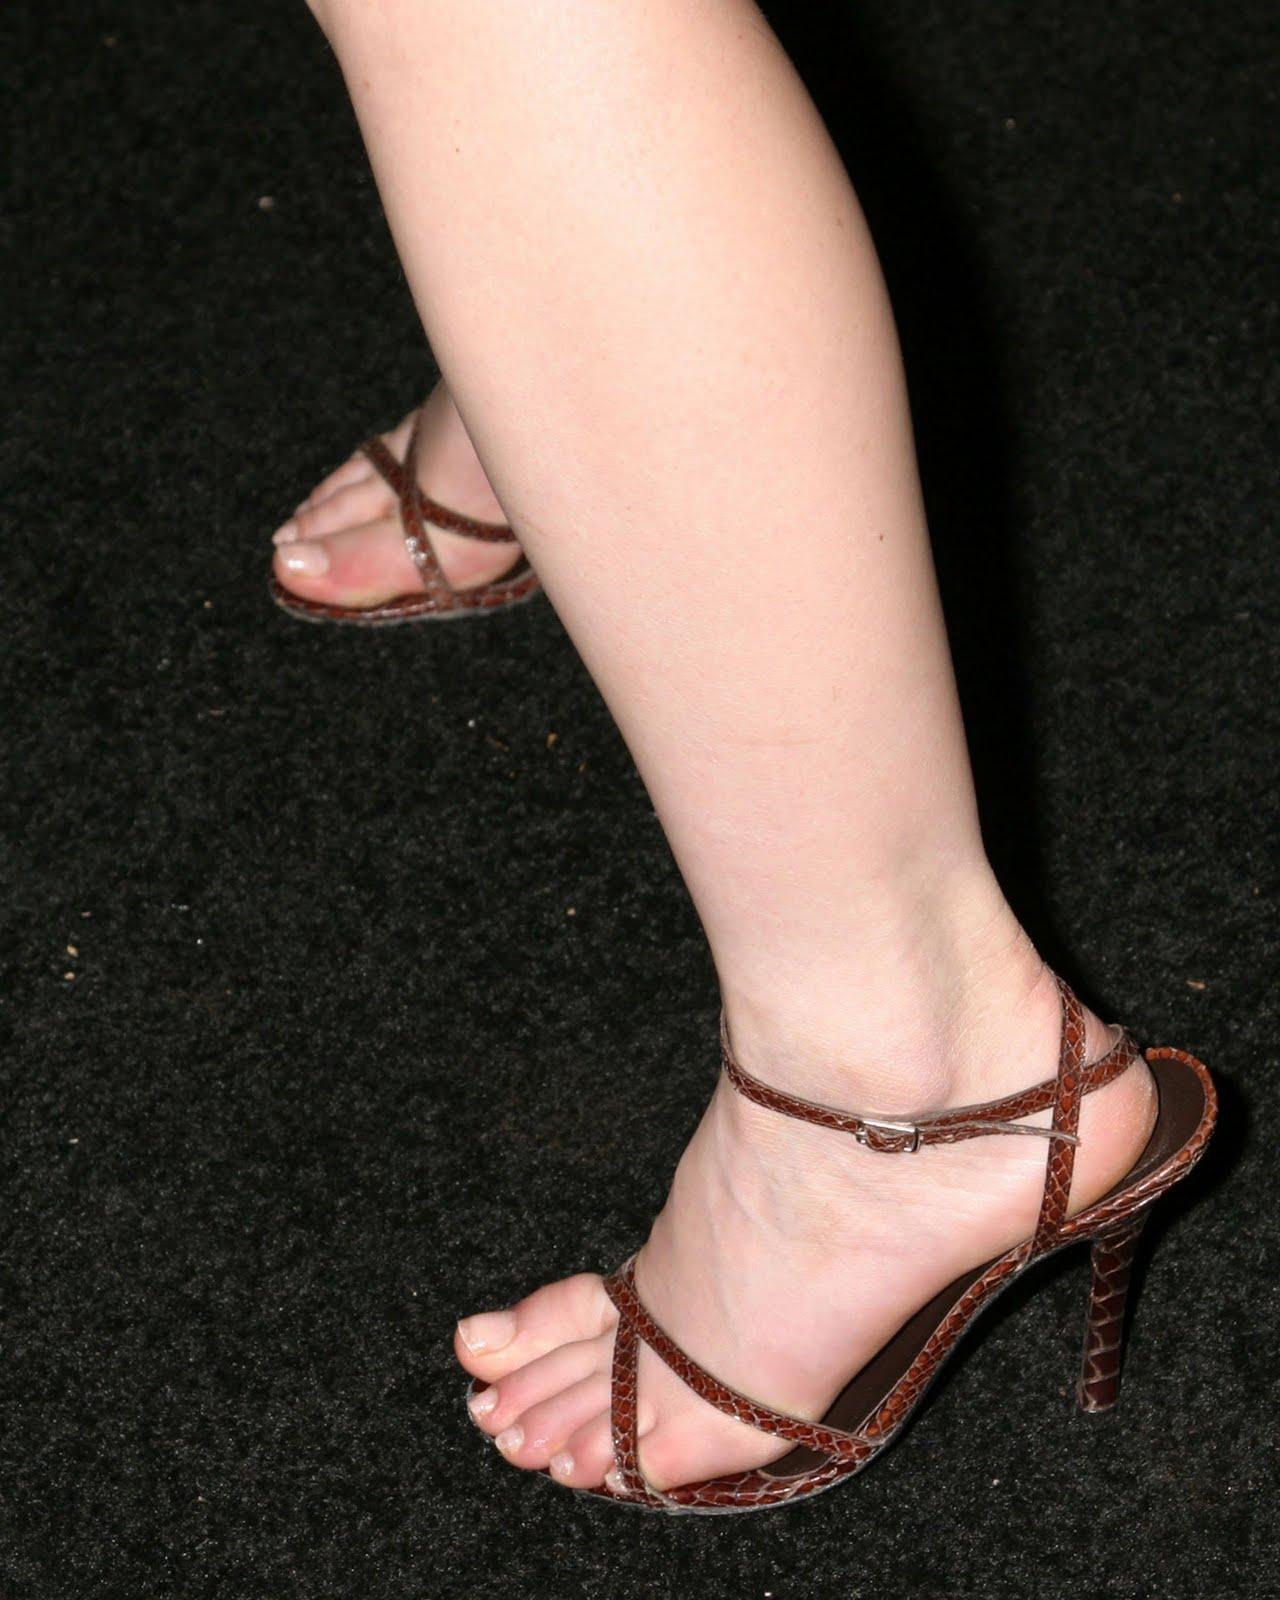 http://1.bp.blogspot.com/_UaLWp72nij4/TFHliZbIzhI/AAAAAAAASi8/AOmFDK_z9nE/s1600/tara-reid-feet-5.jpg